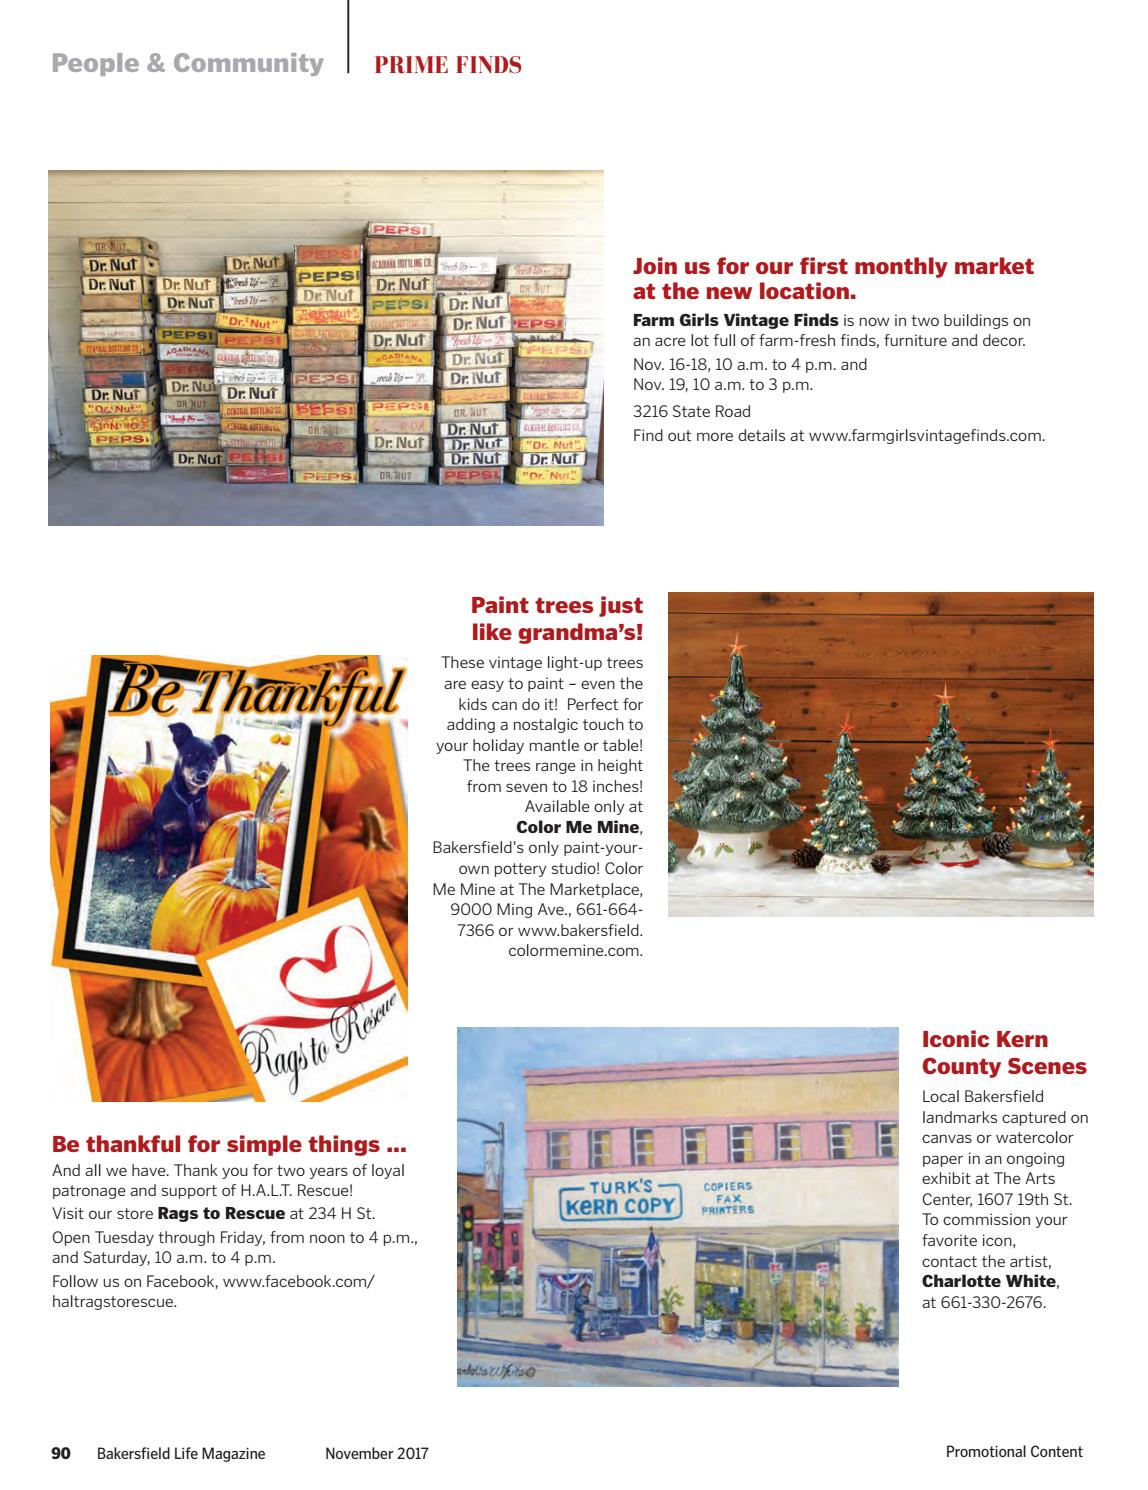 Bakersfield Life Magazine November 2017 by The Bakersfield